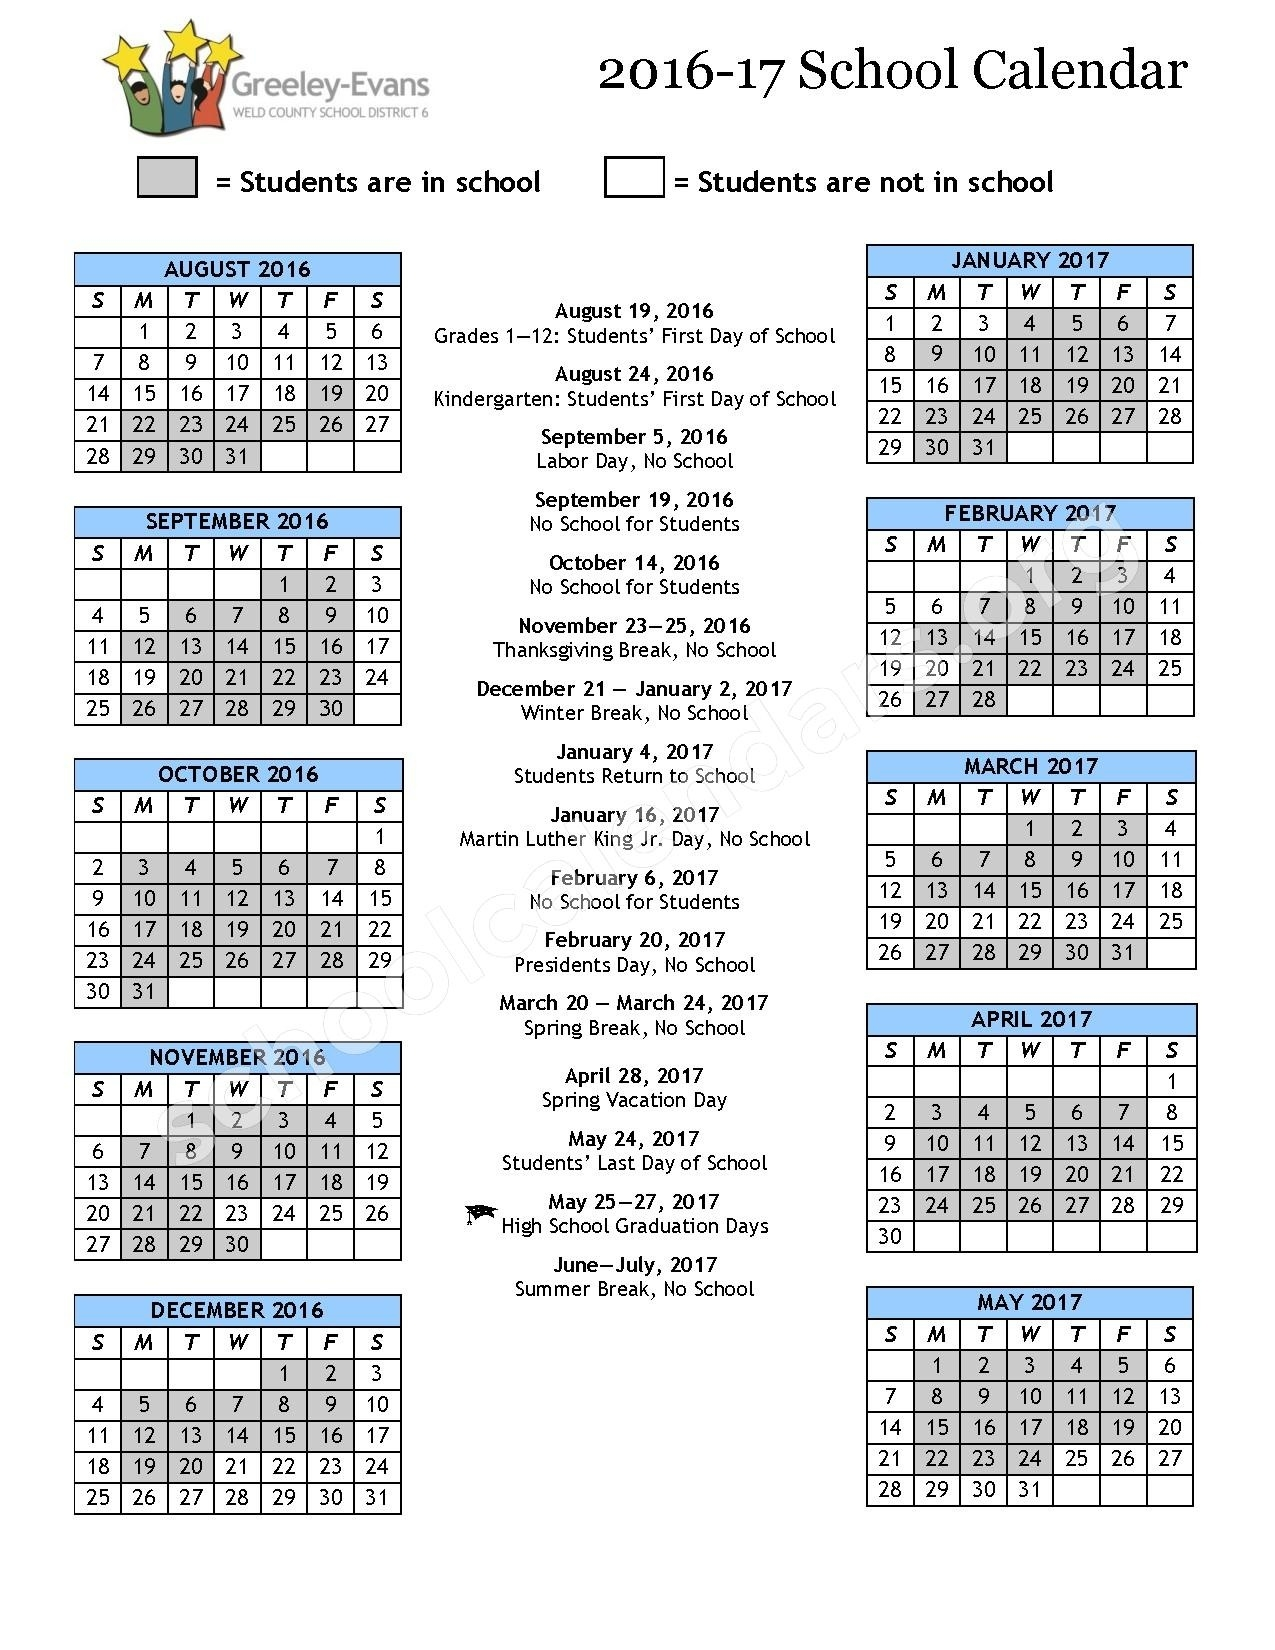 2016 - 2017 District Calendar | Greeley-Evans School District 6_District 6 School Year Calendar